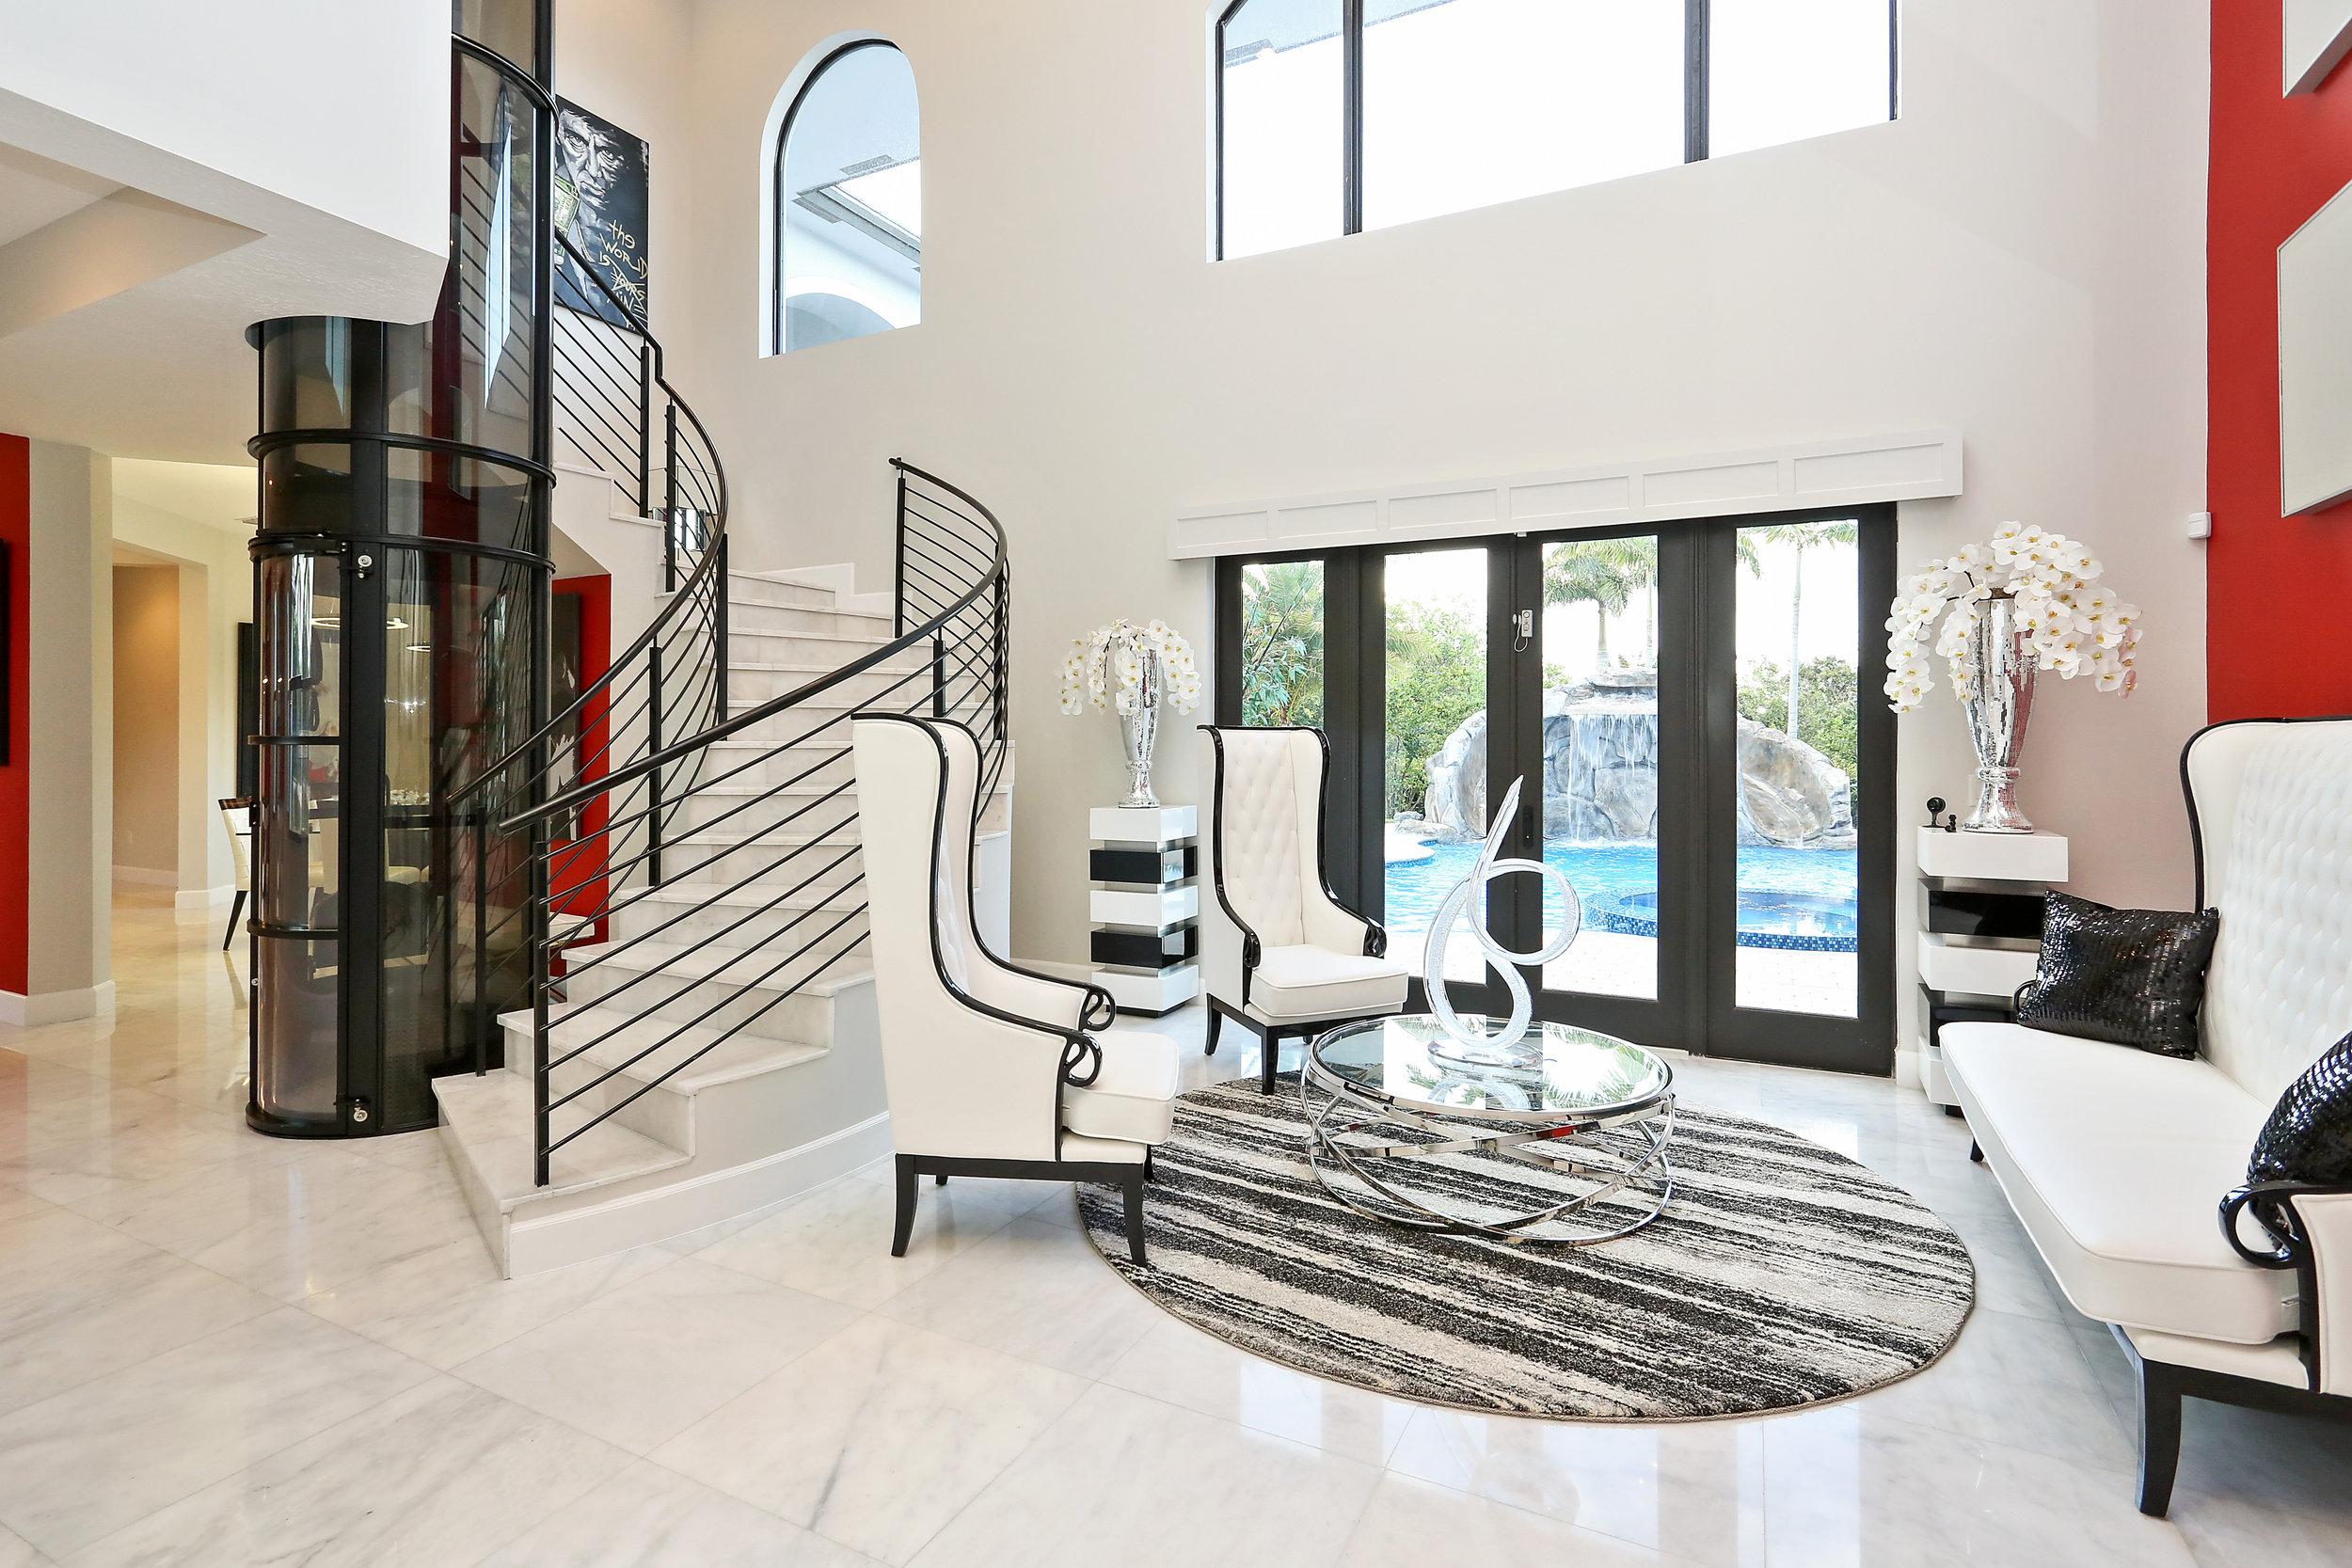 NBA Star Charlie Villanueva Sells Davie Estate For $2.25 Million